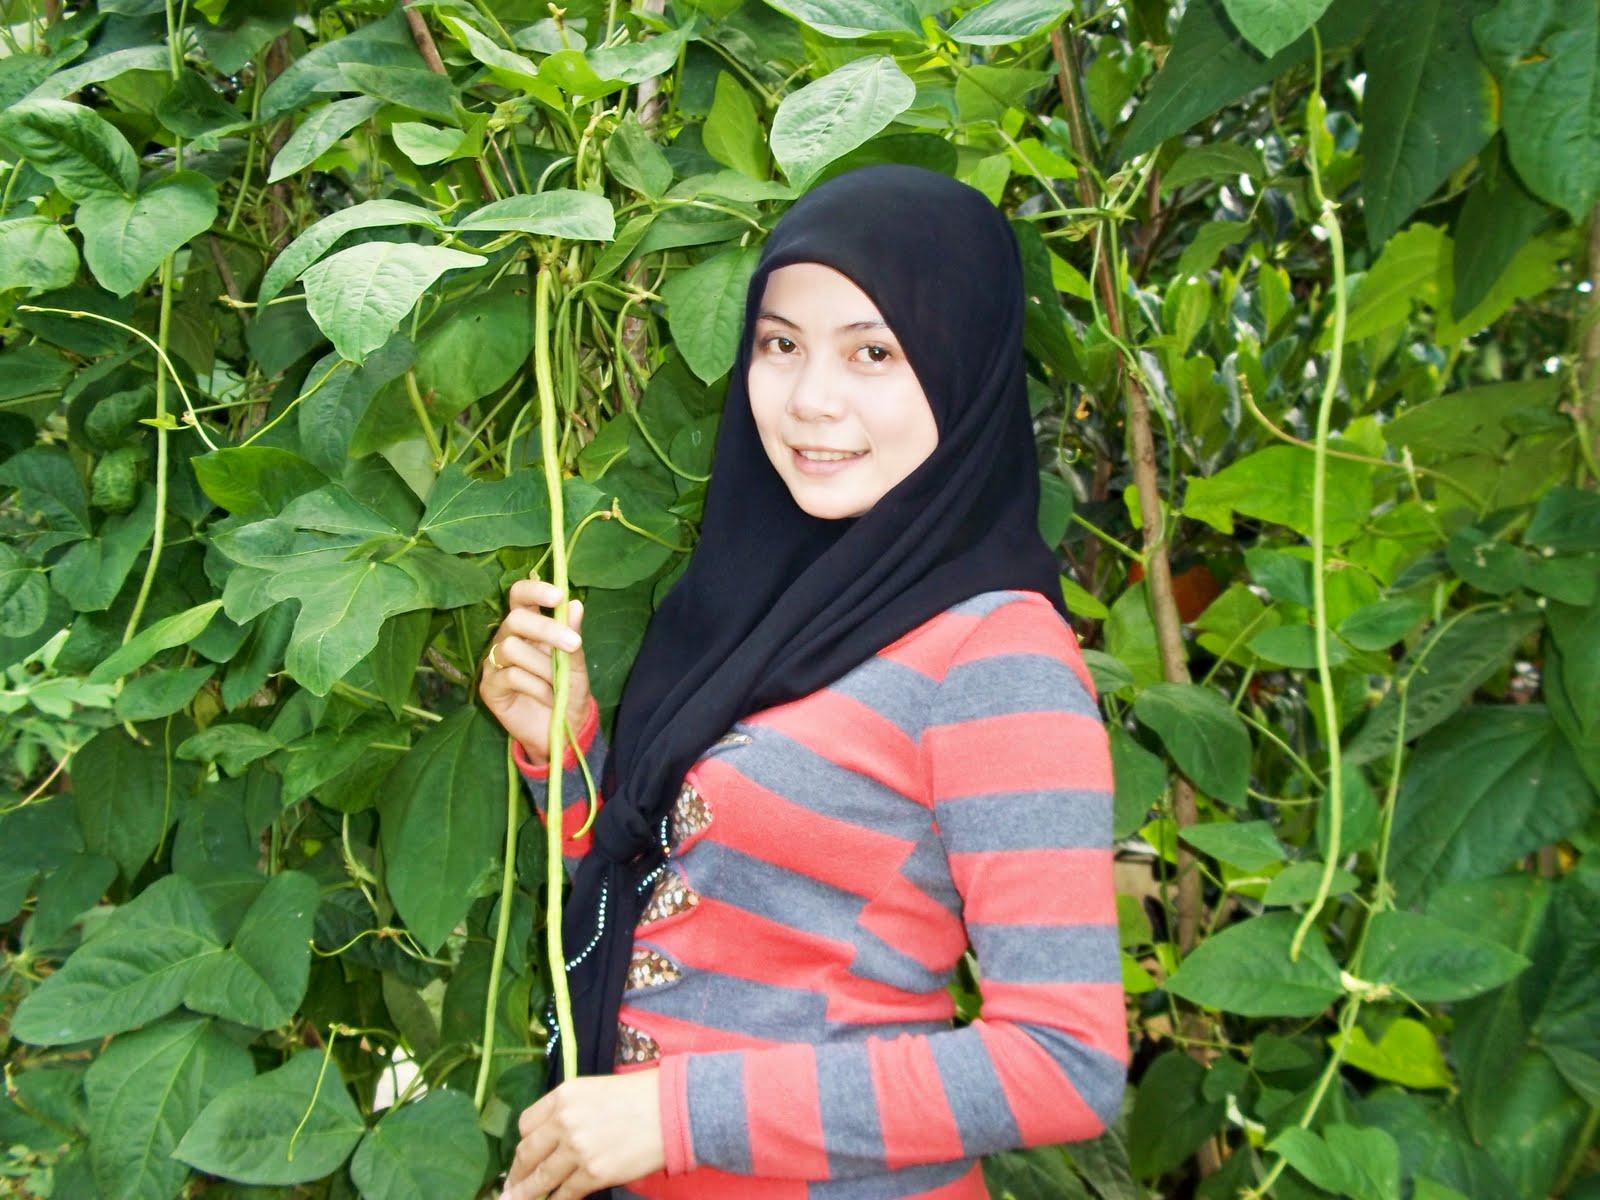 Search Results for 'Makalah Pertumbuhan Tanaman Kacang Hijau.html'